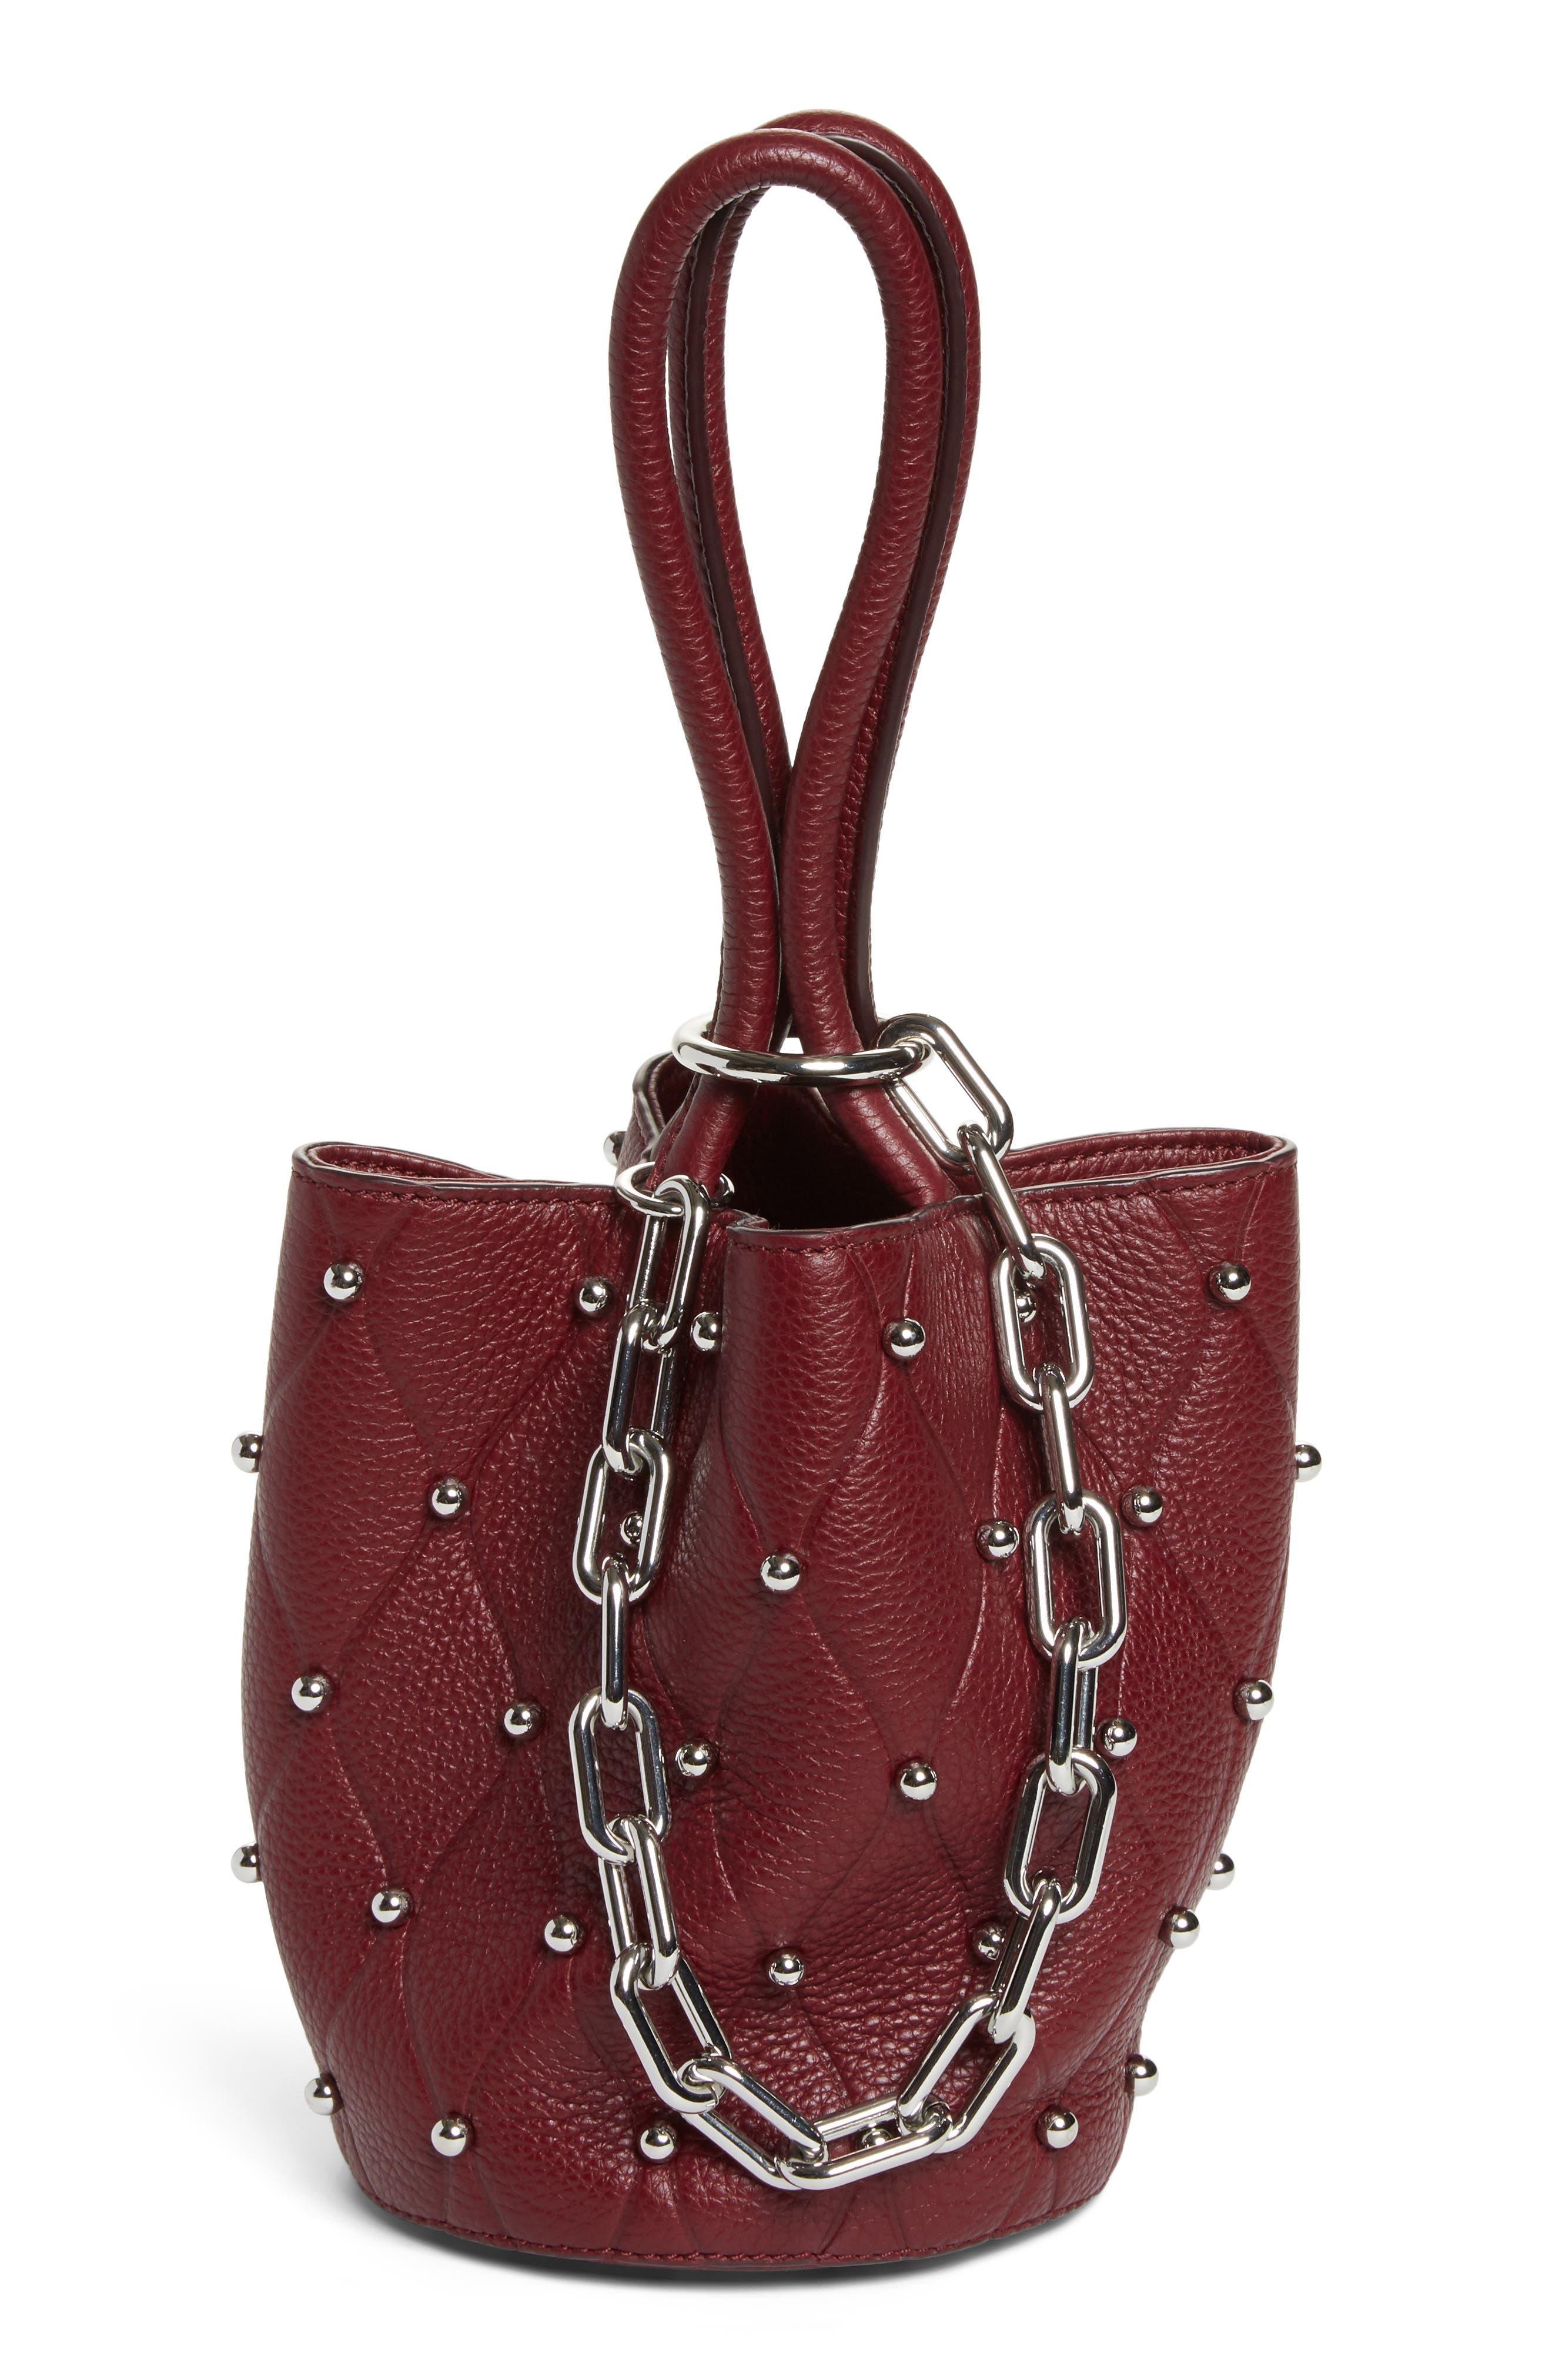 Alexander Wang Mini Roxy Studded Leather Bucket Bag